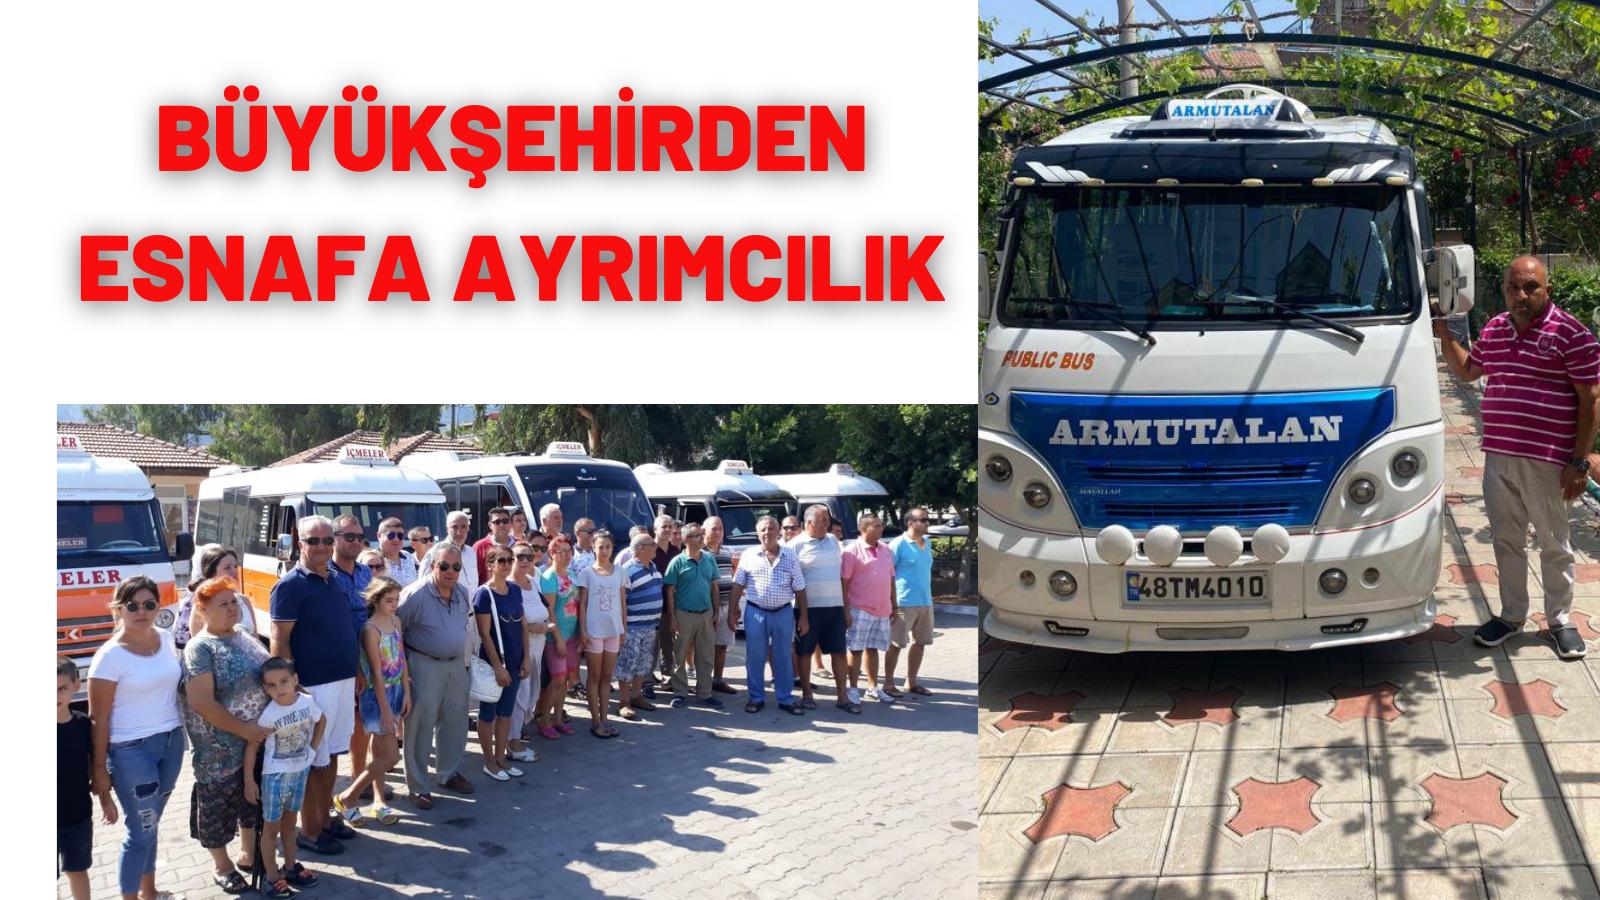 CHP'Lİ BELEDİYEDEN ESNAFA ÇİFTE STANDART